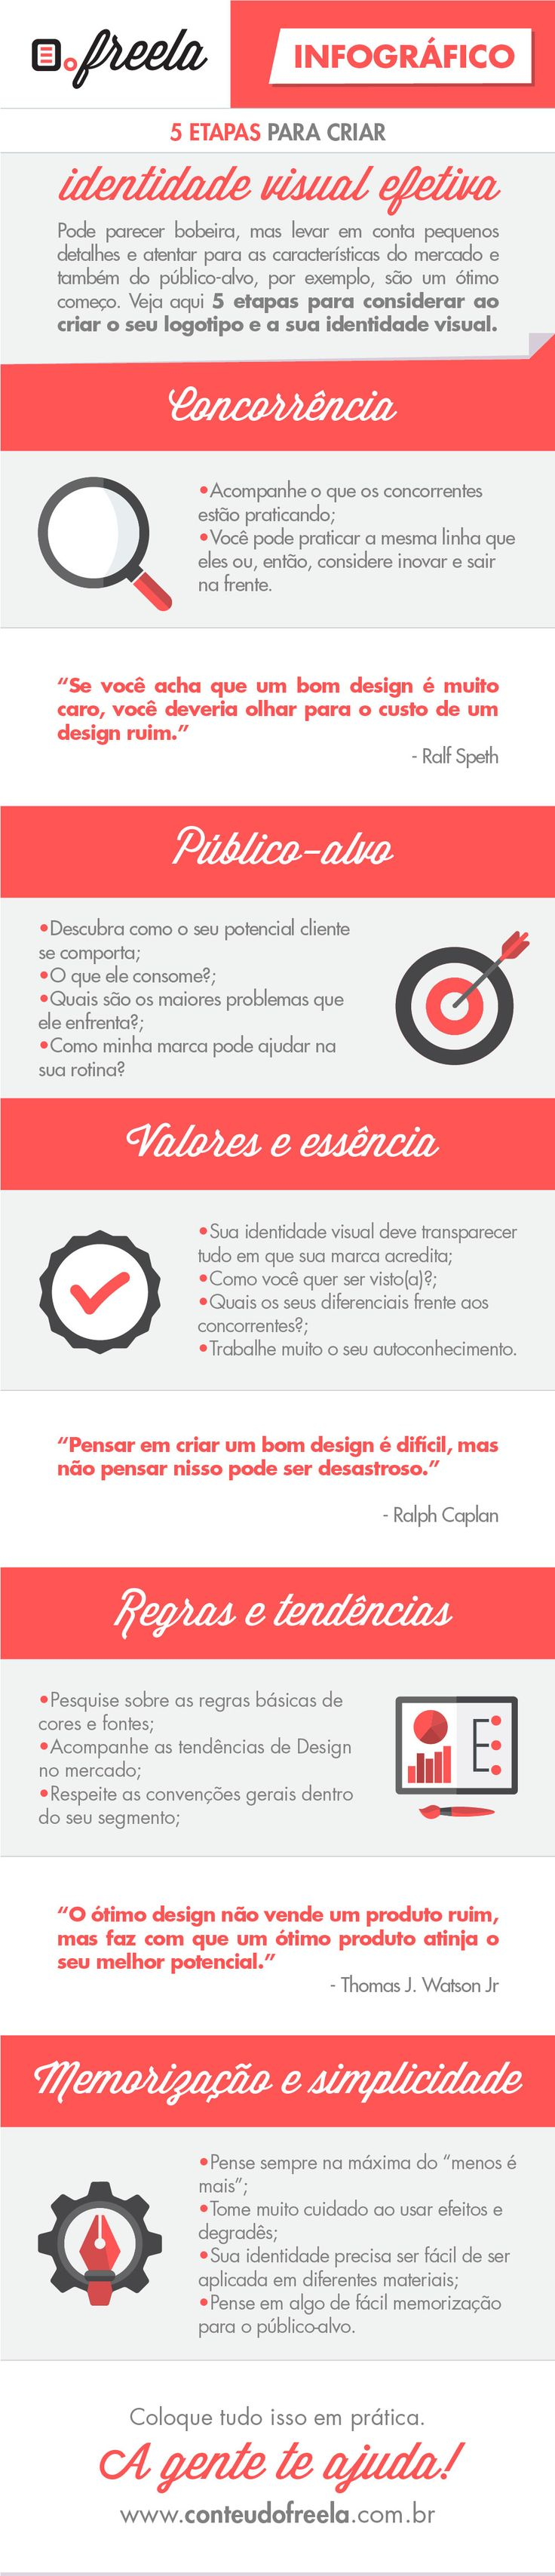 #infografico #identidadevisual #design #empresas #negocios #ideias